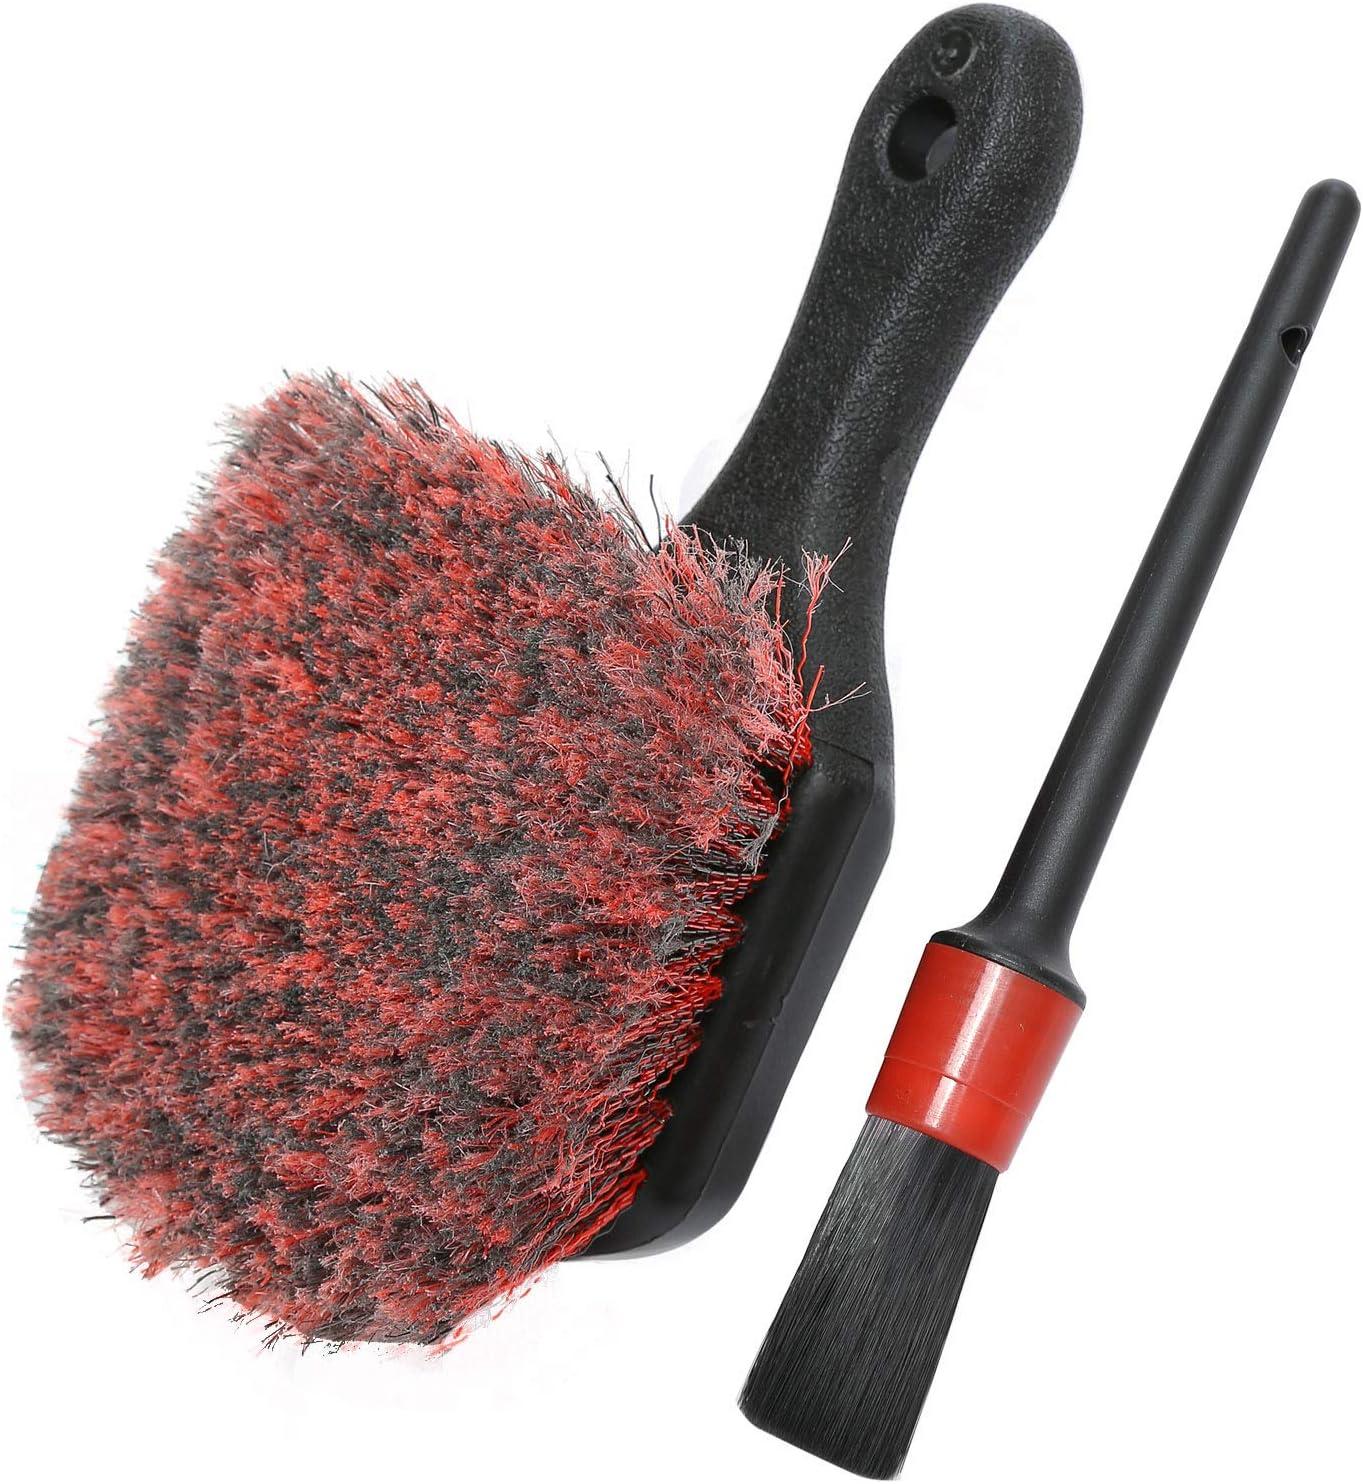 Wheel & Tire Brush, Soft Bristle Auto Wash Brush, Free Detailing Brush, Cleans Dirty Tires & Releases Dirt und Road Grime, Short Handle für Easy Scrubbing